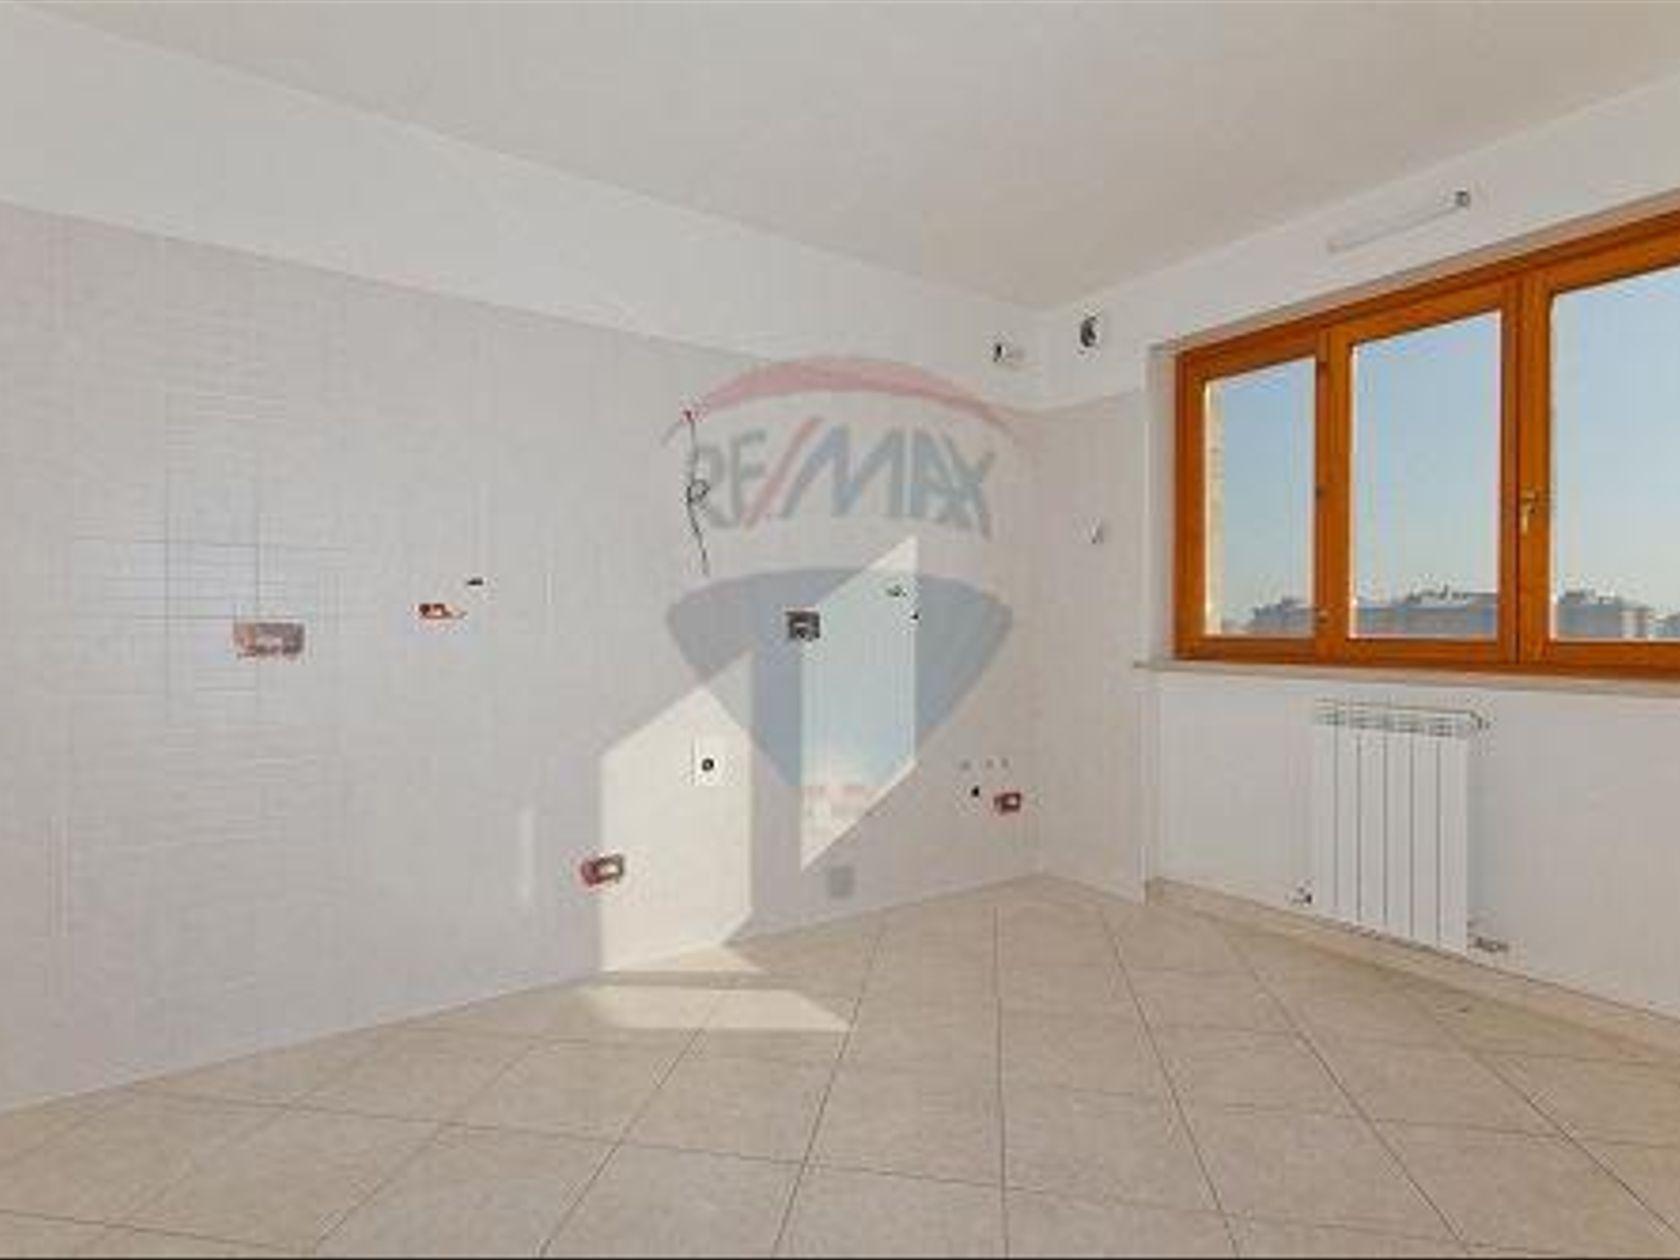 Appartamento Torino-madonna Di Campagna Borgo Vittoria Barrlanz, Torino, TO Vendita - Foto 4